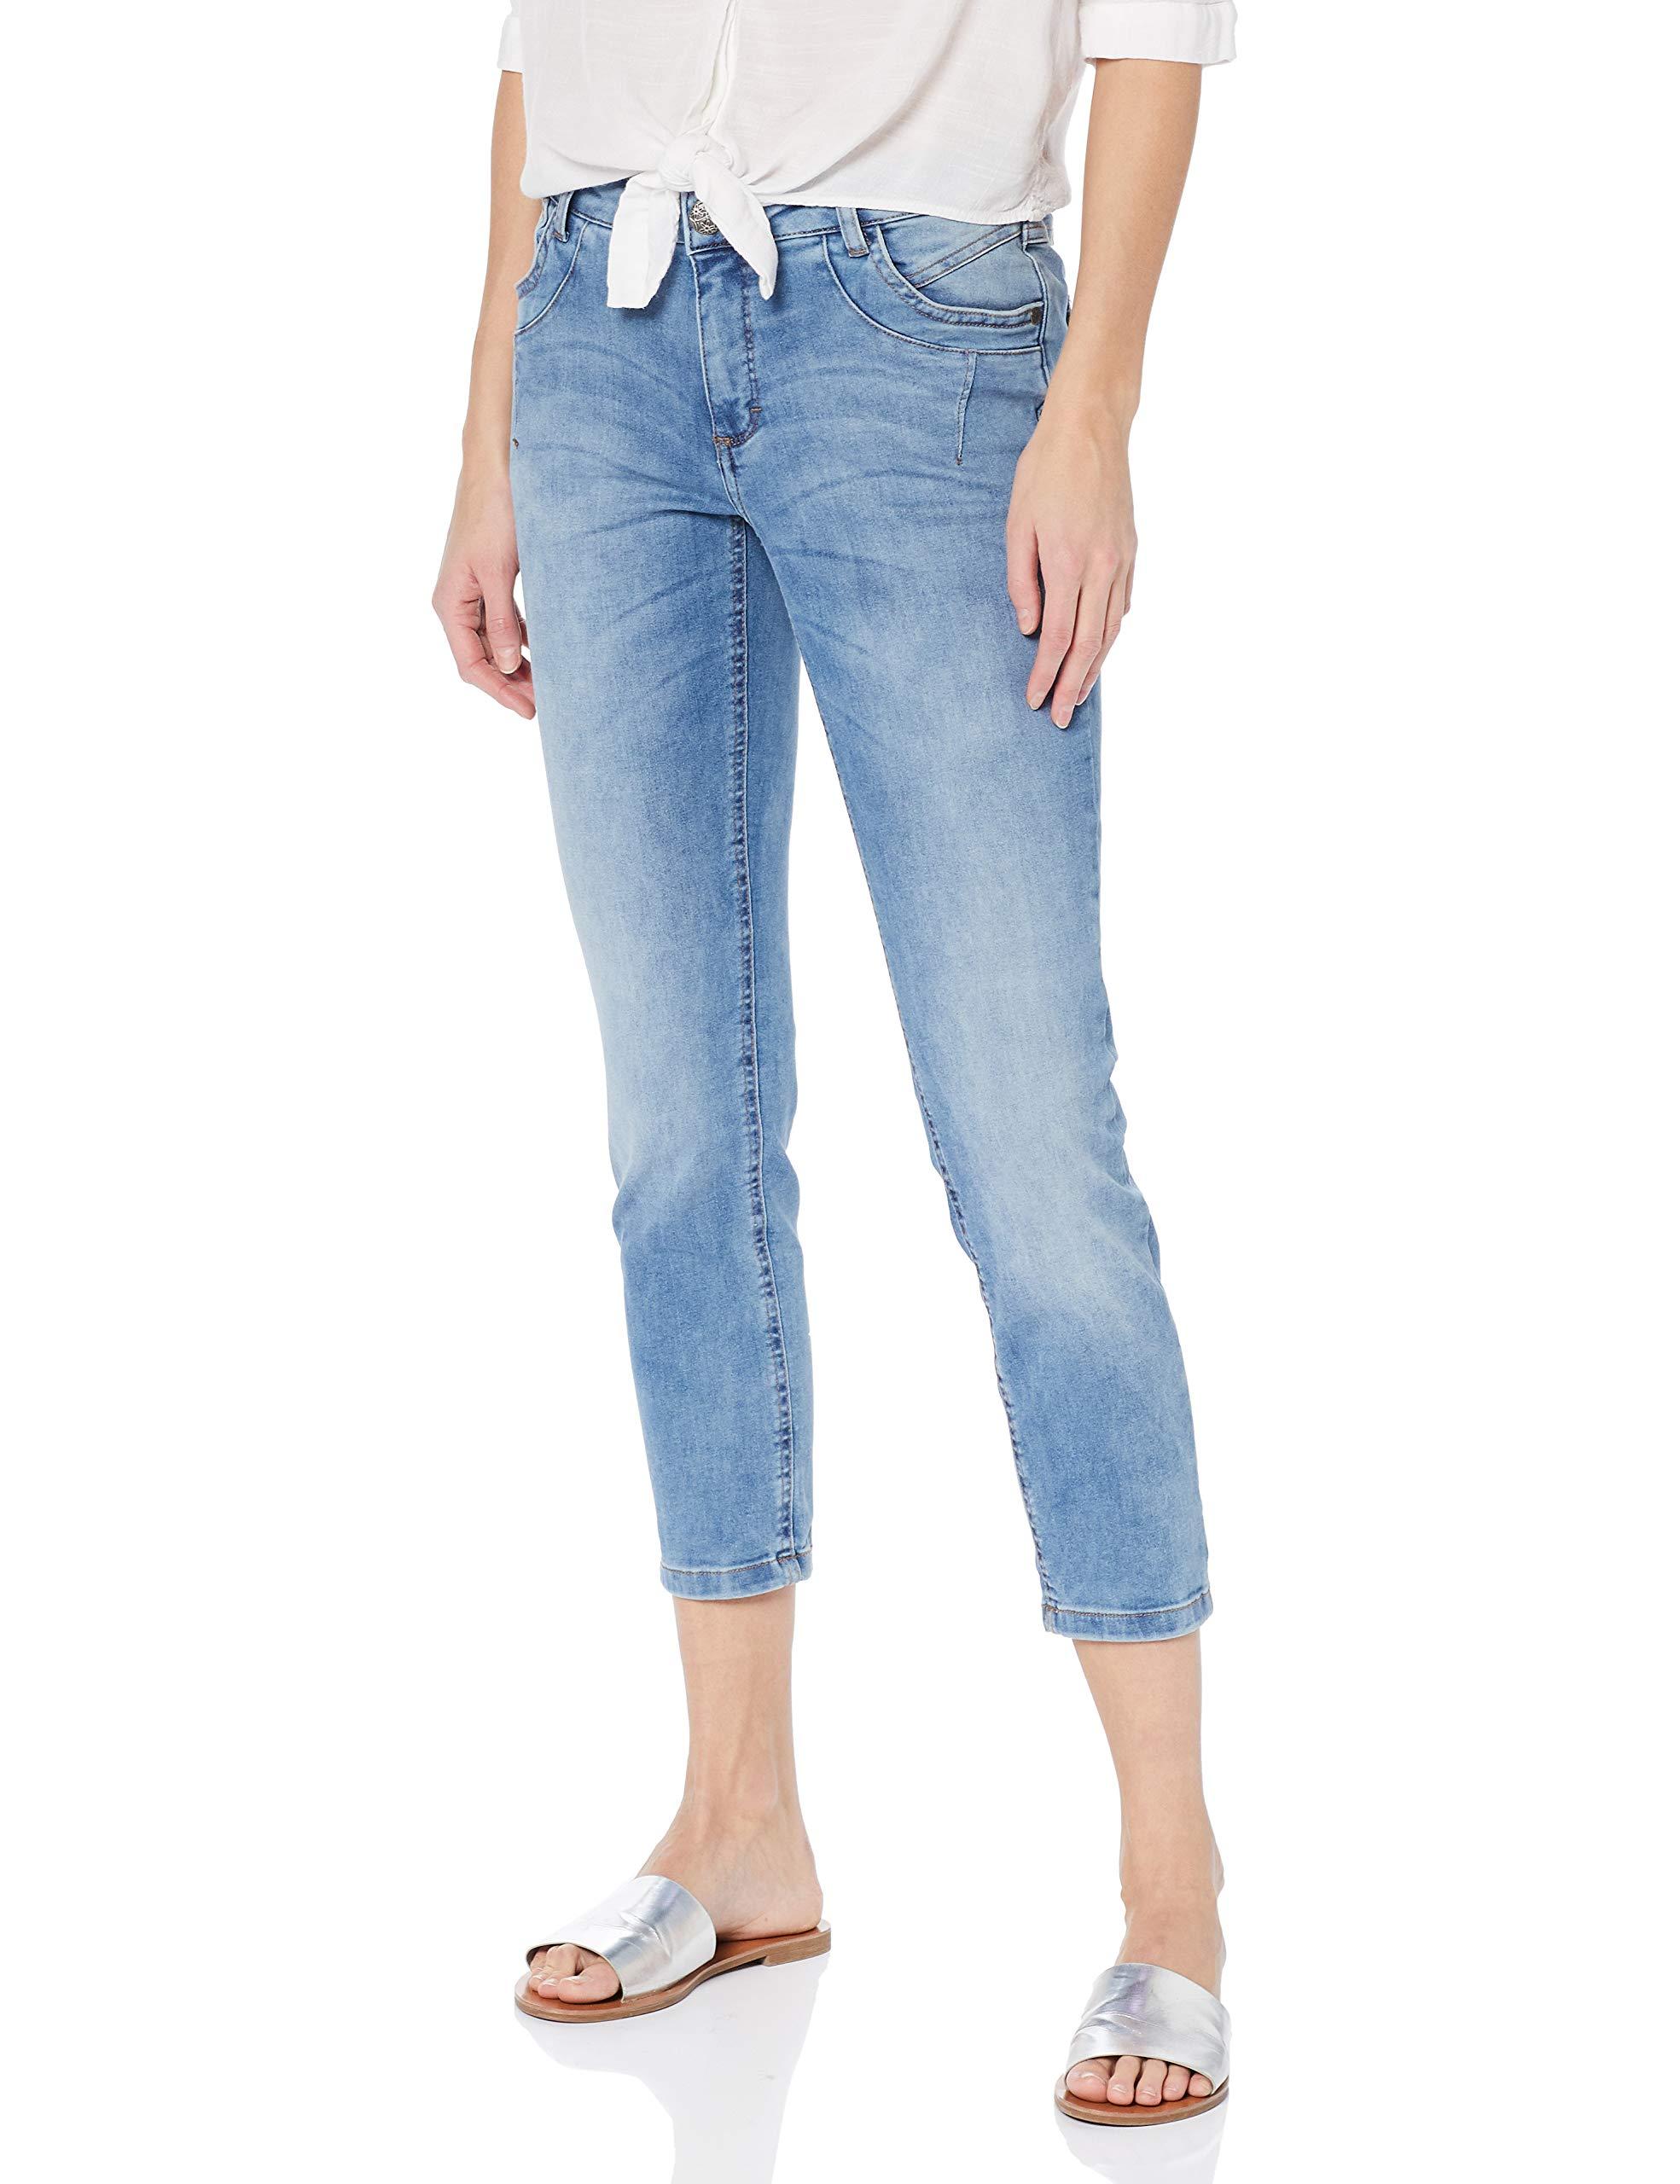 Pocket Laura Coin Knöchellang Jeans 9244taille Fabricant42Femme Julia SlimBleubleached Gina nXN0OP8wk